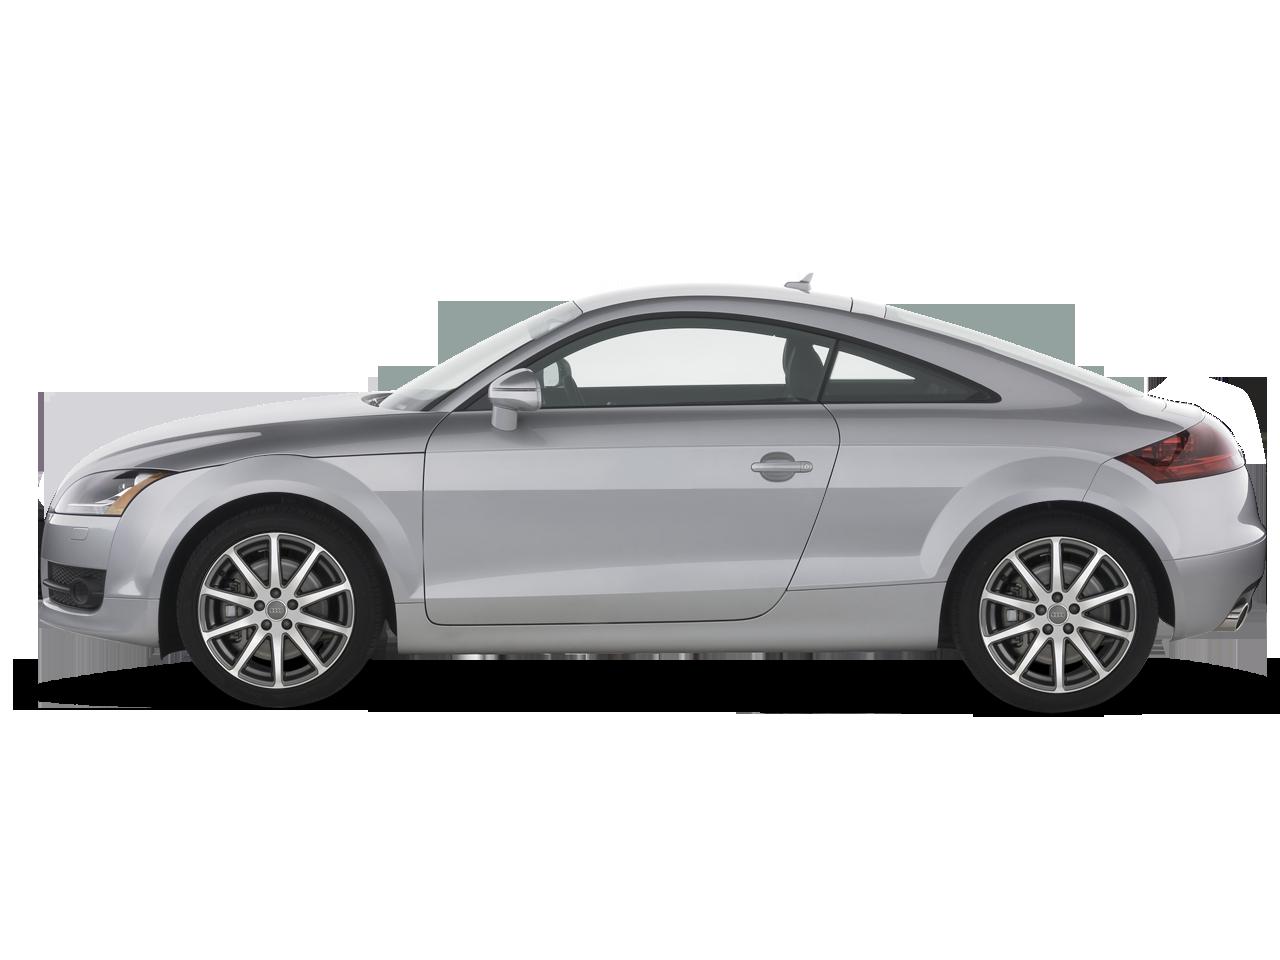 2009 audi tts roadster audi sport coupe convertible review automobile magazine. Black Bedroom Furniture Sets. Home Design Ideas